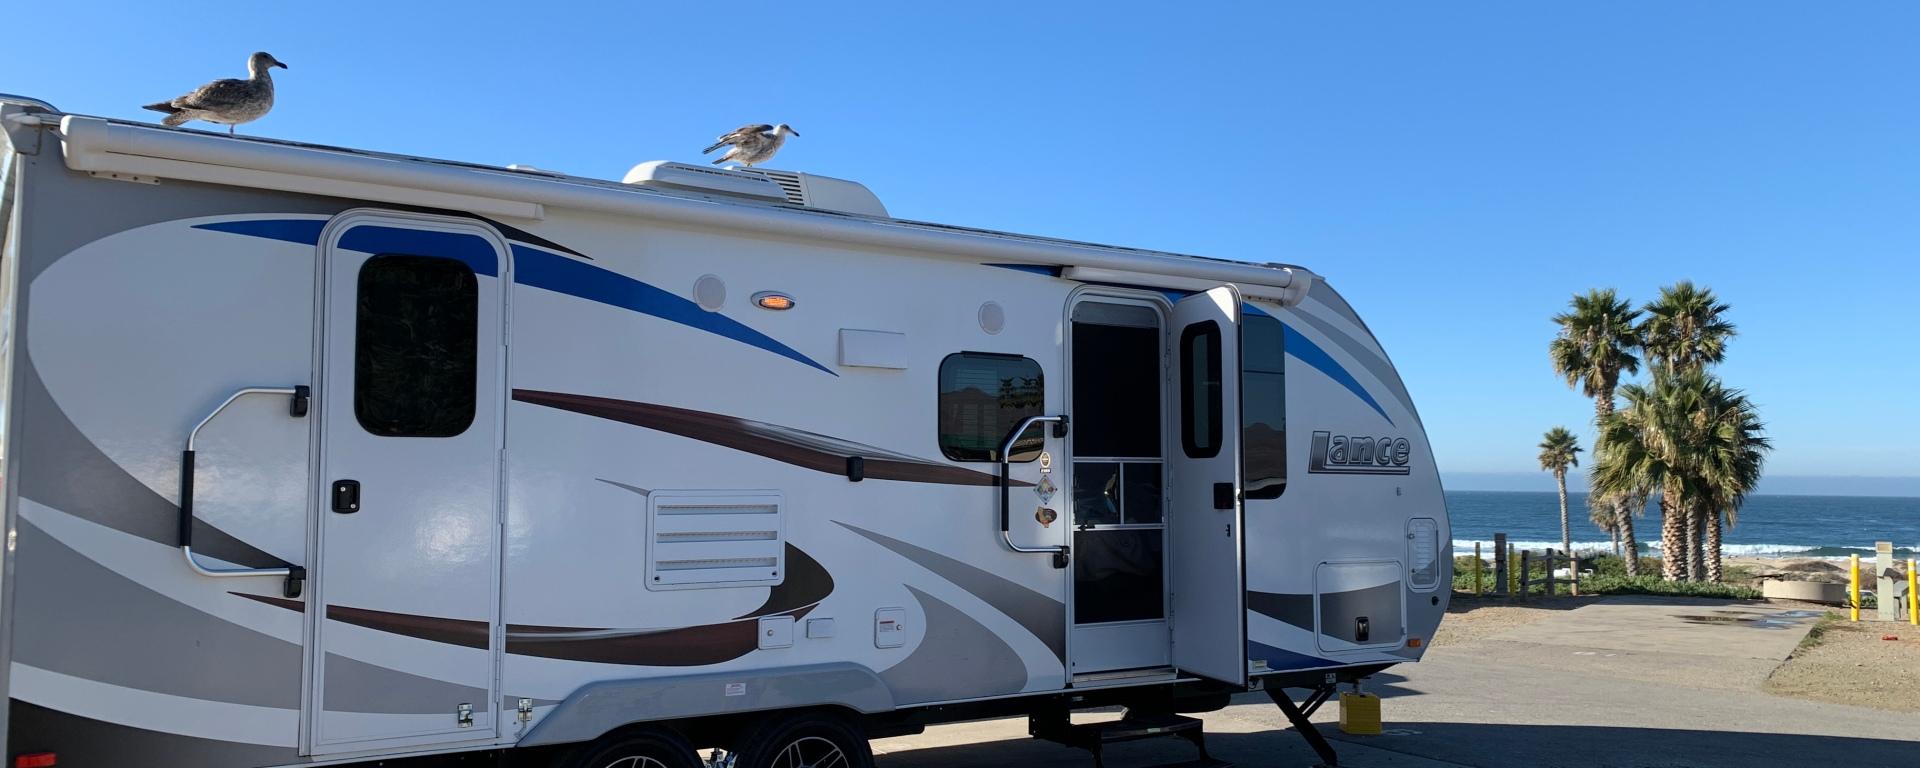 Image of a travel trailer prior to pre-launch checklist